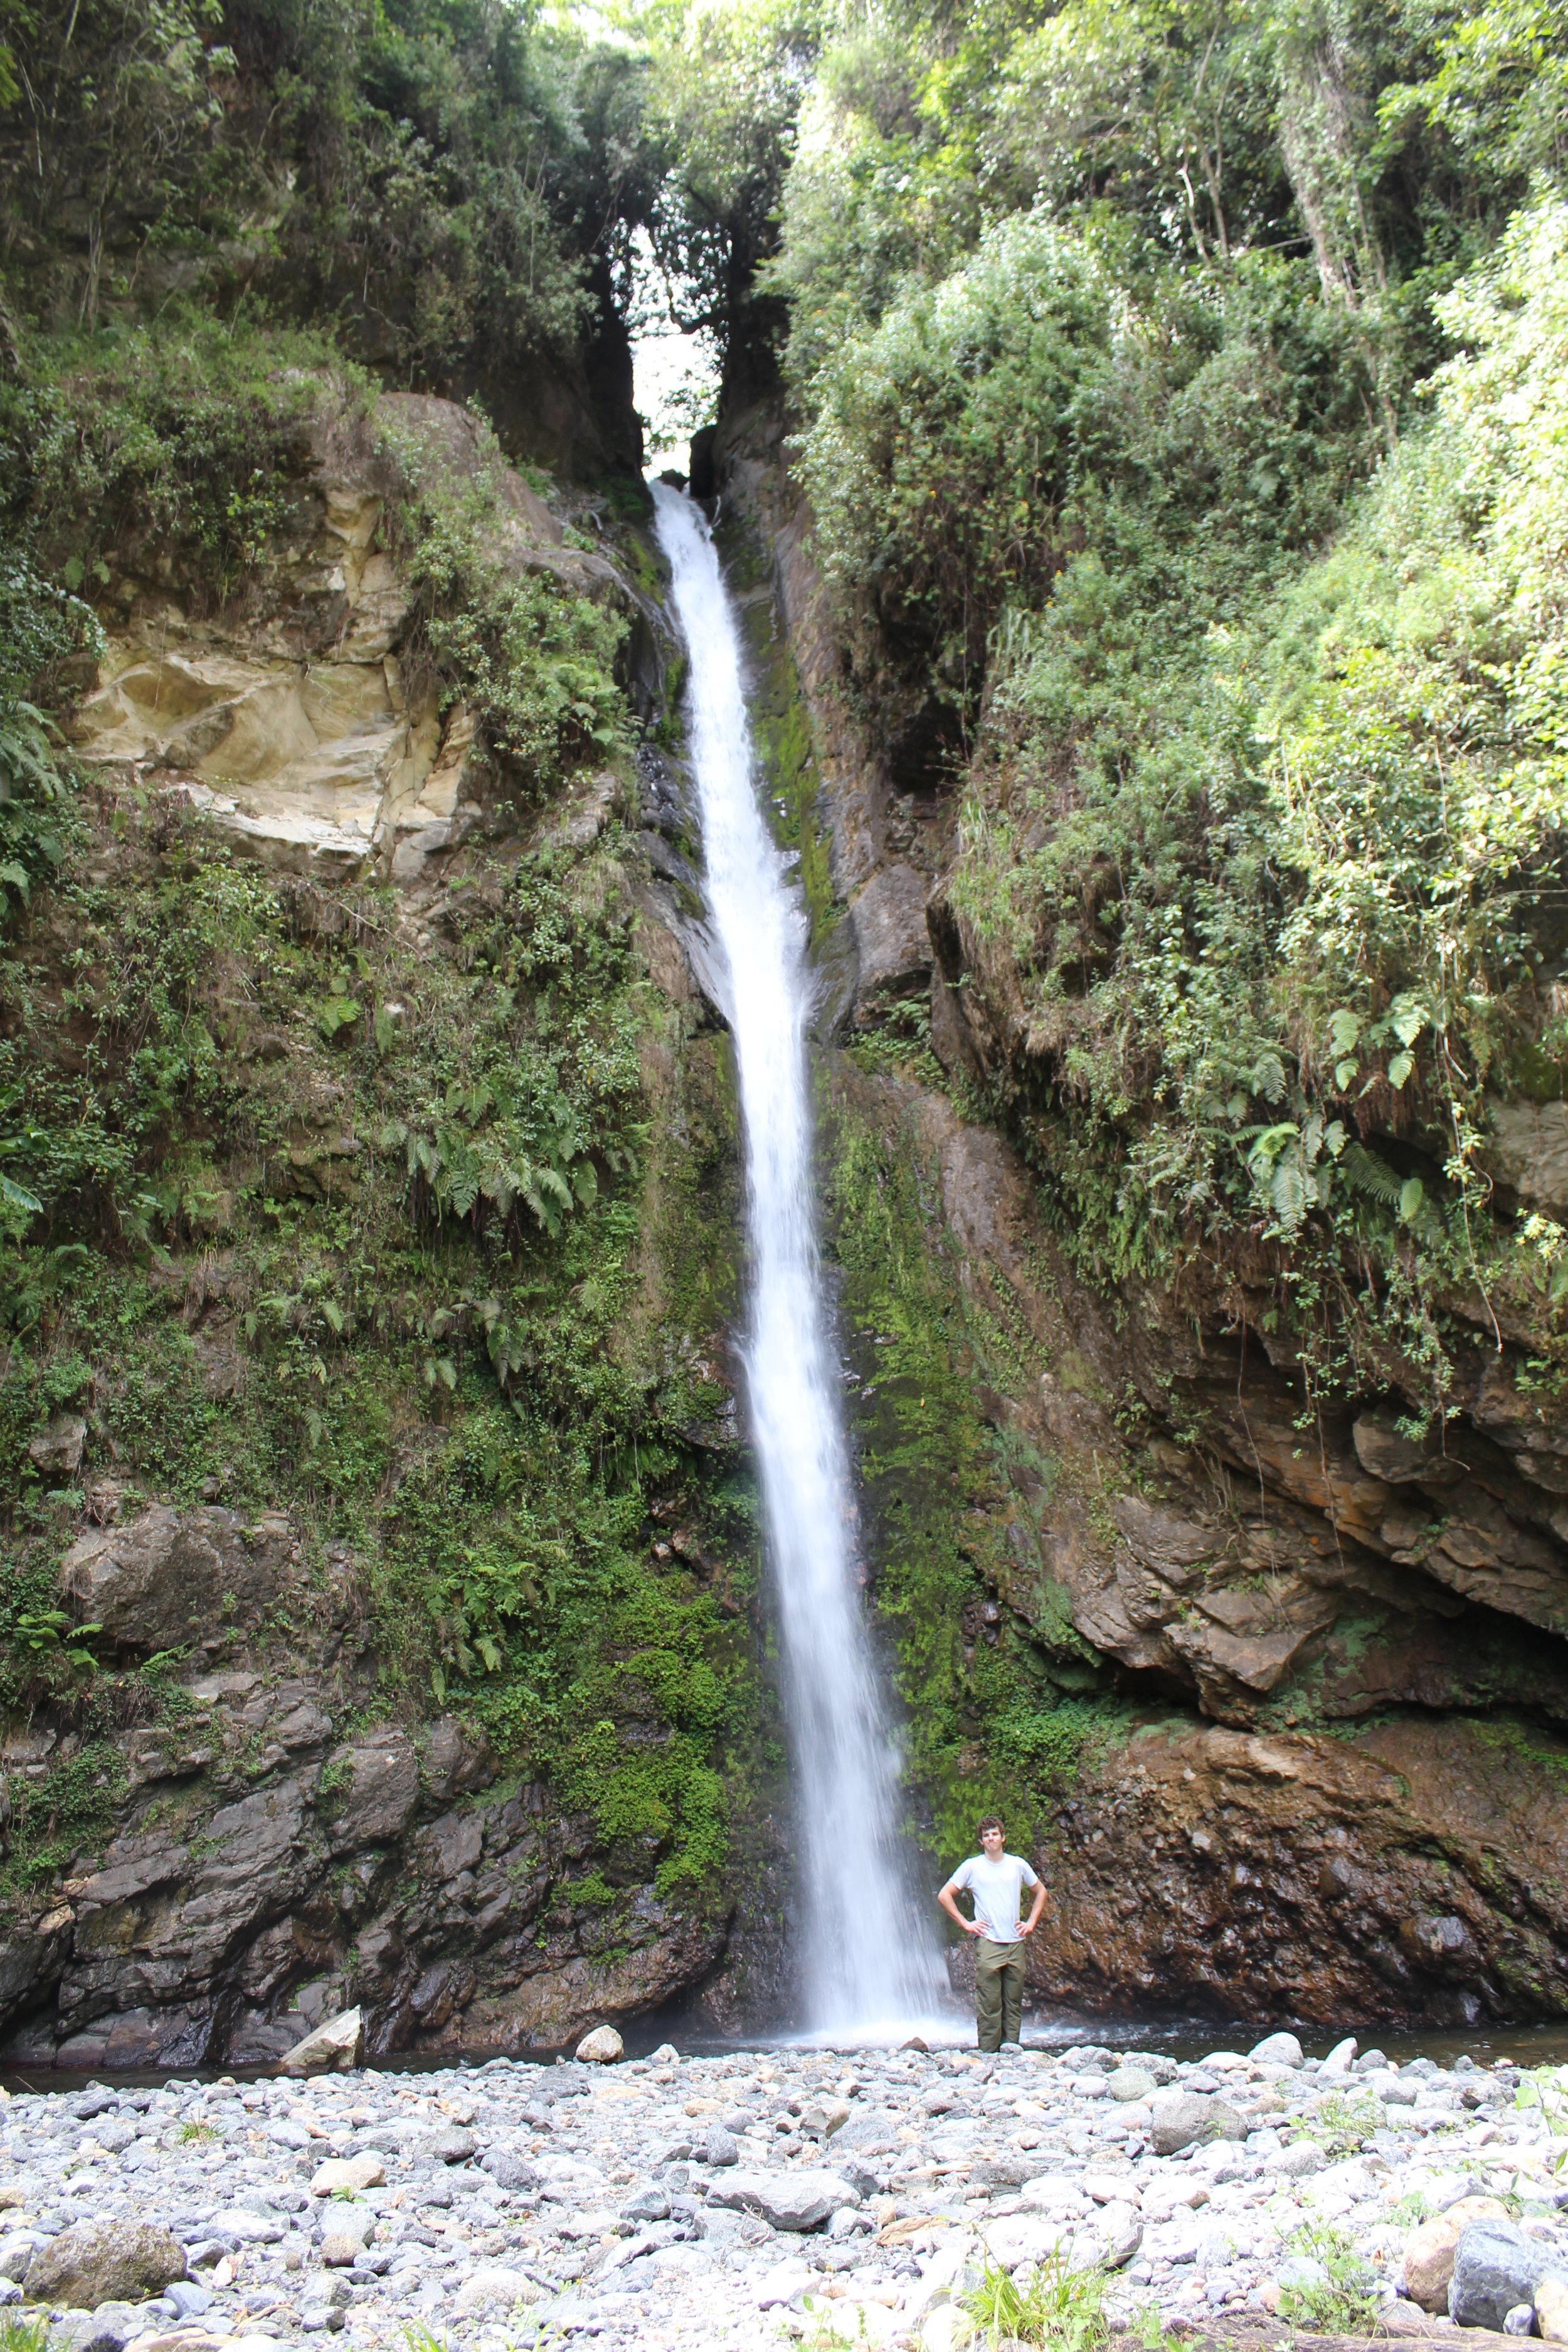 Pretty waterfall at the base of Mount Meru.